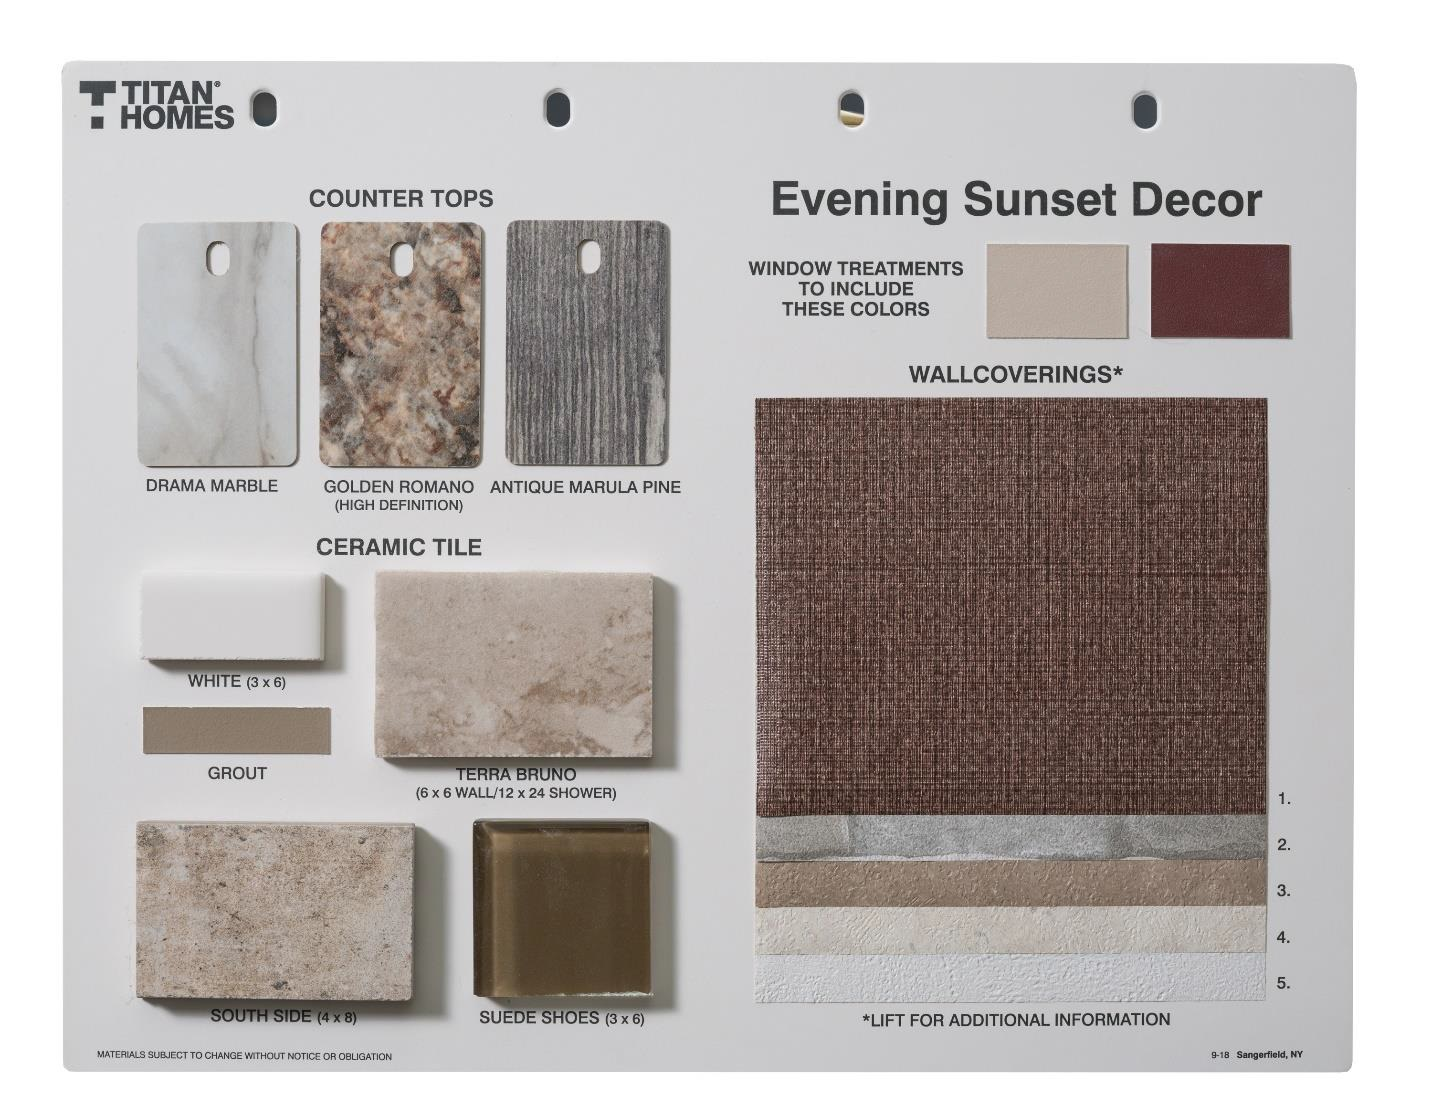 Evening Sunset Decor